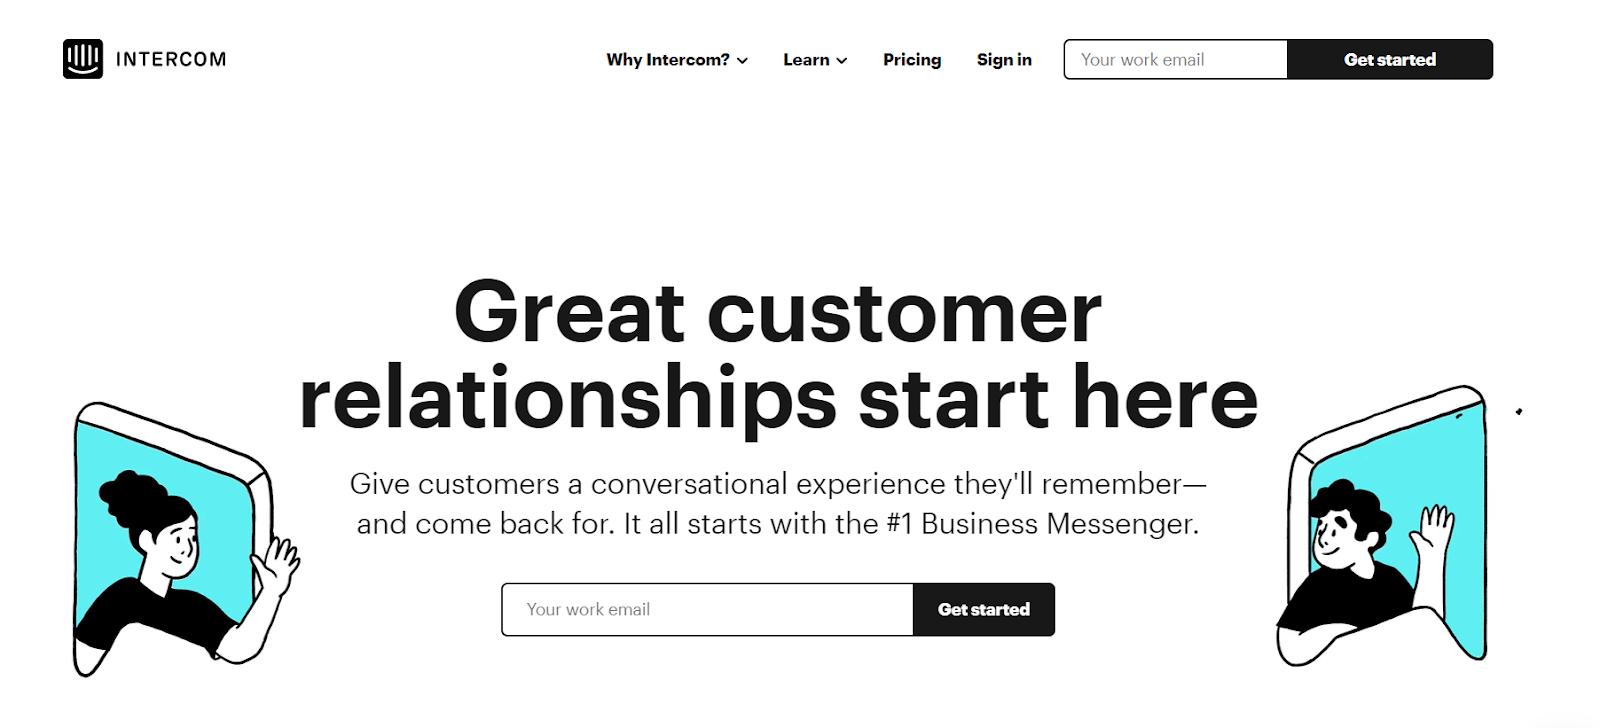 example of symmetrical balance in web design